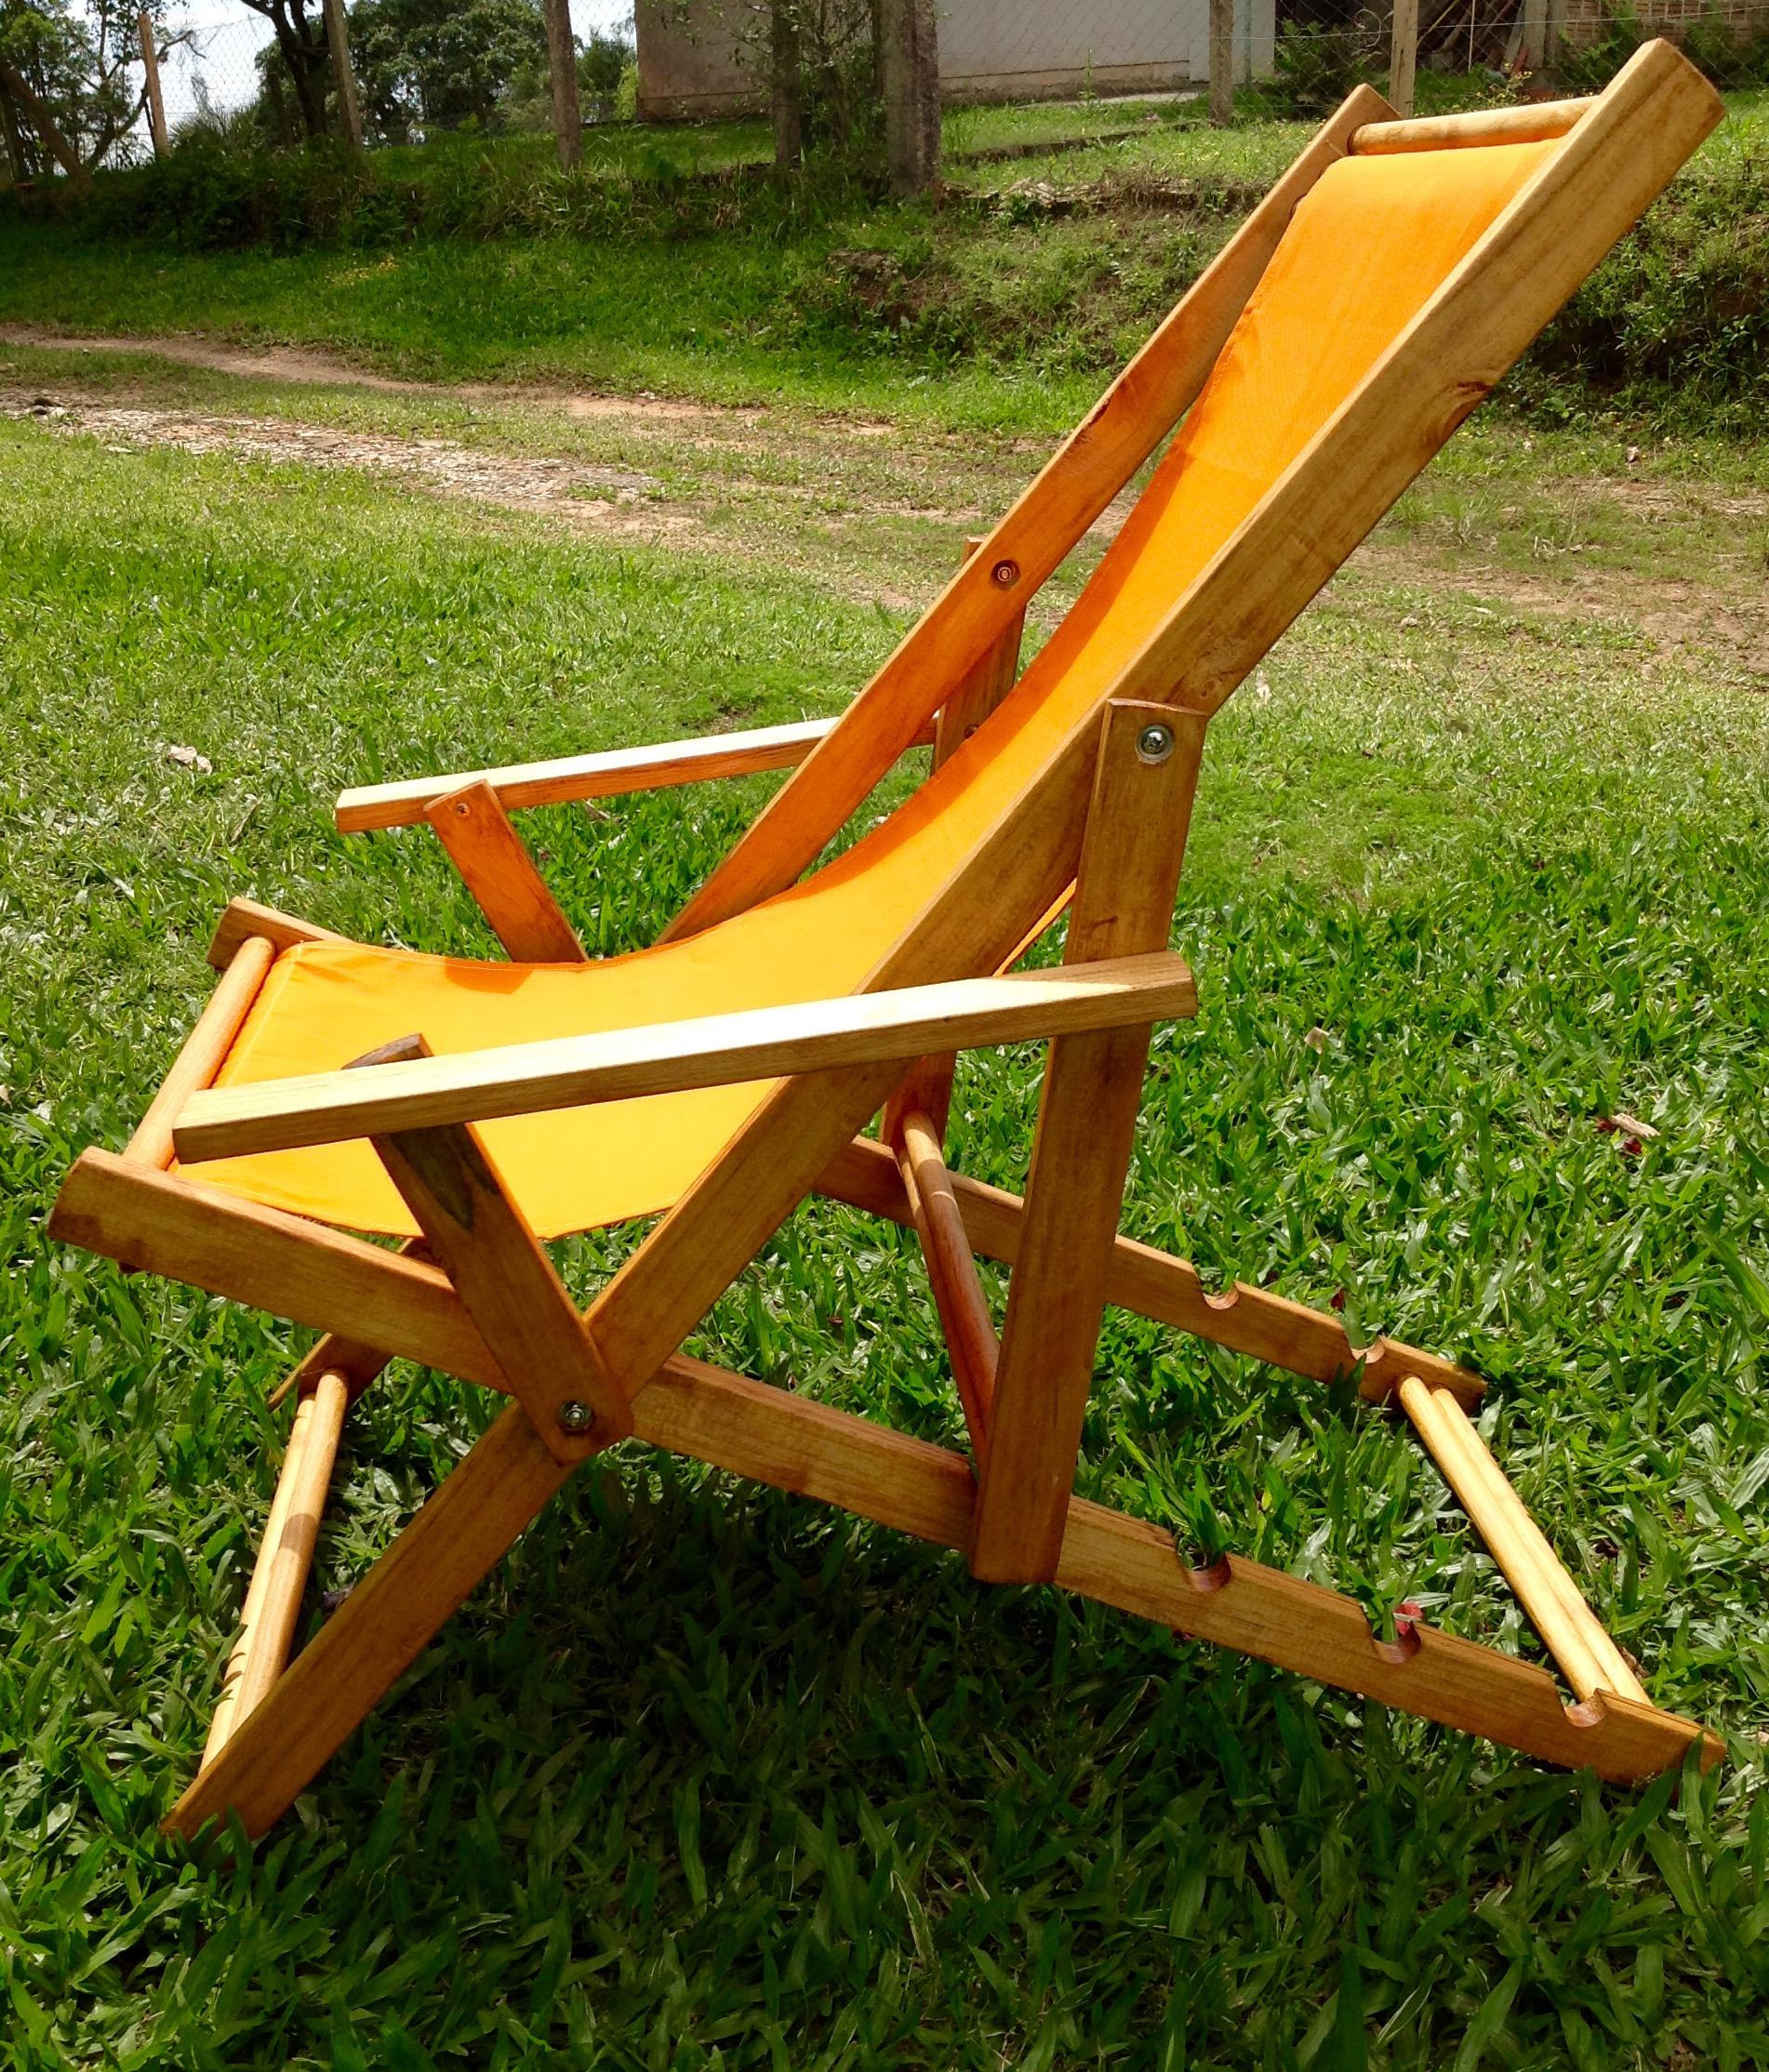 cadeira espreguicadeira cadeira #C99702 1902x2228